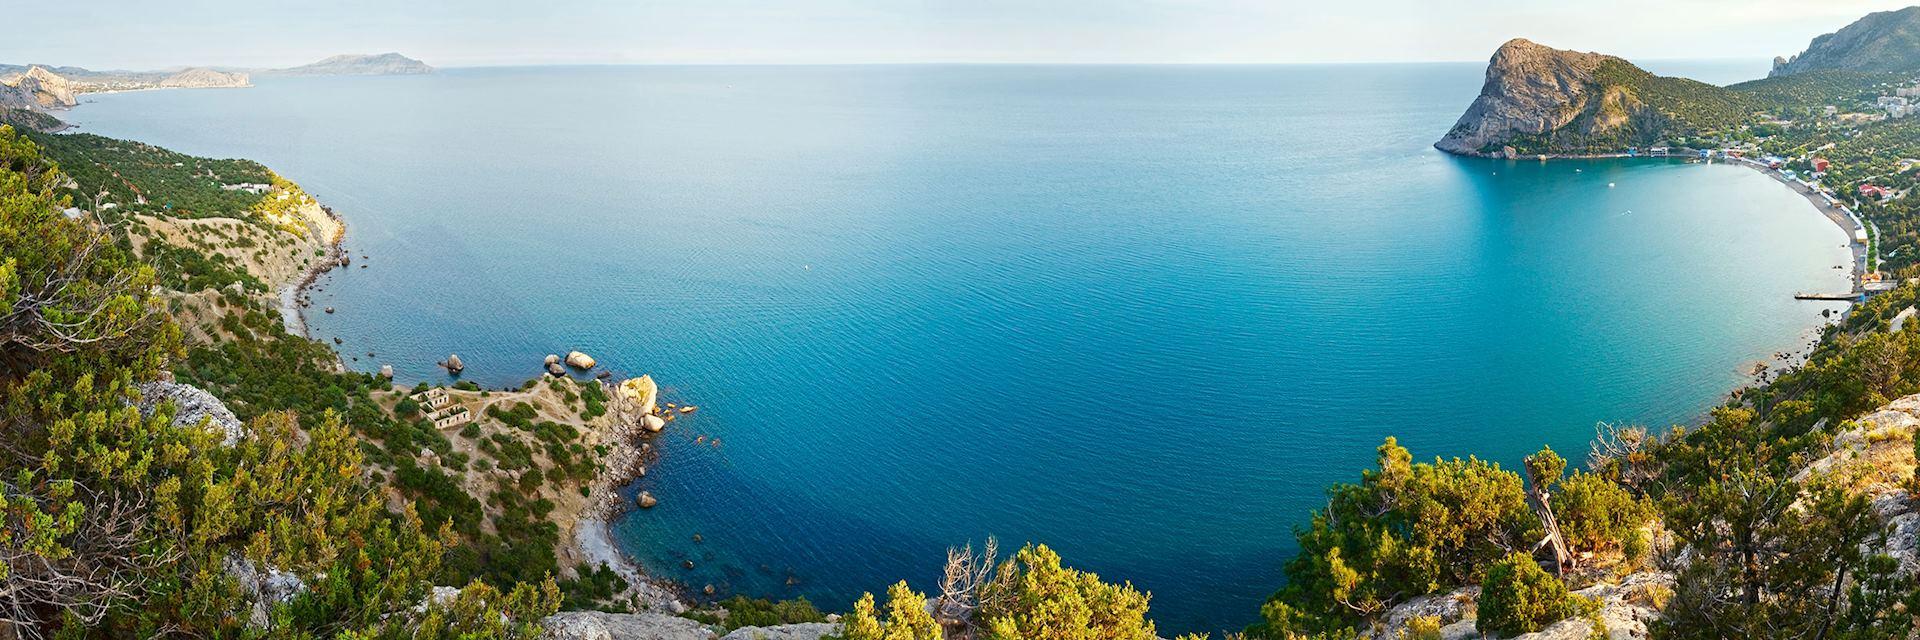 Summer in the Crimea